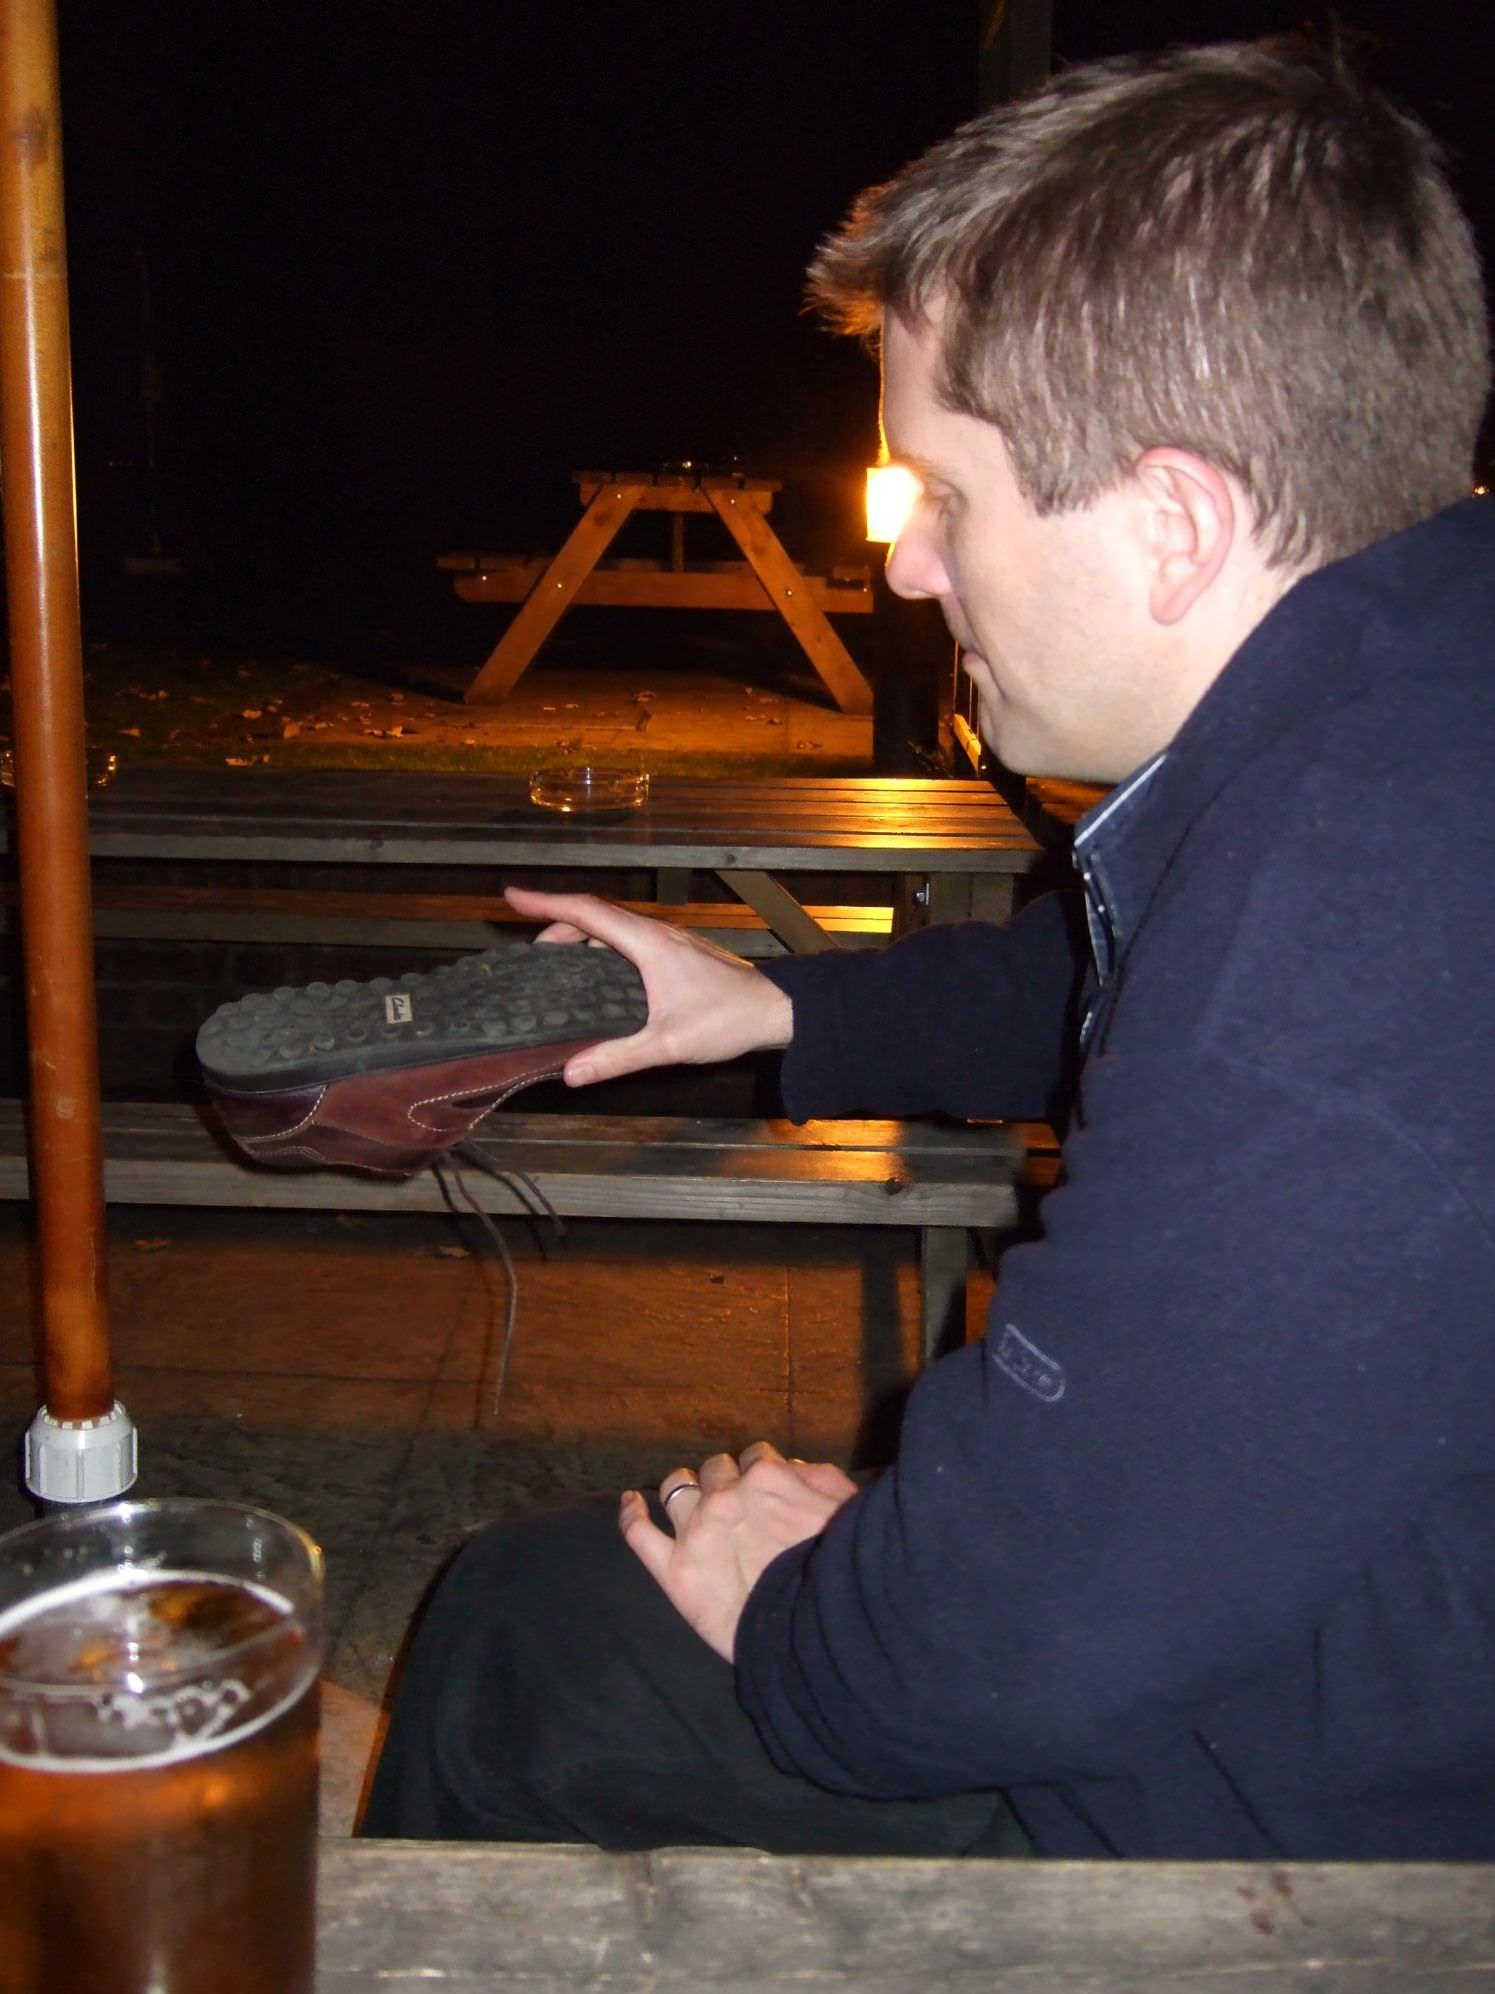 142FPC2007